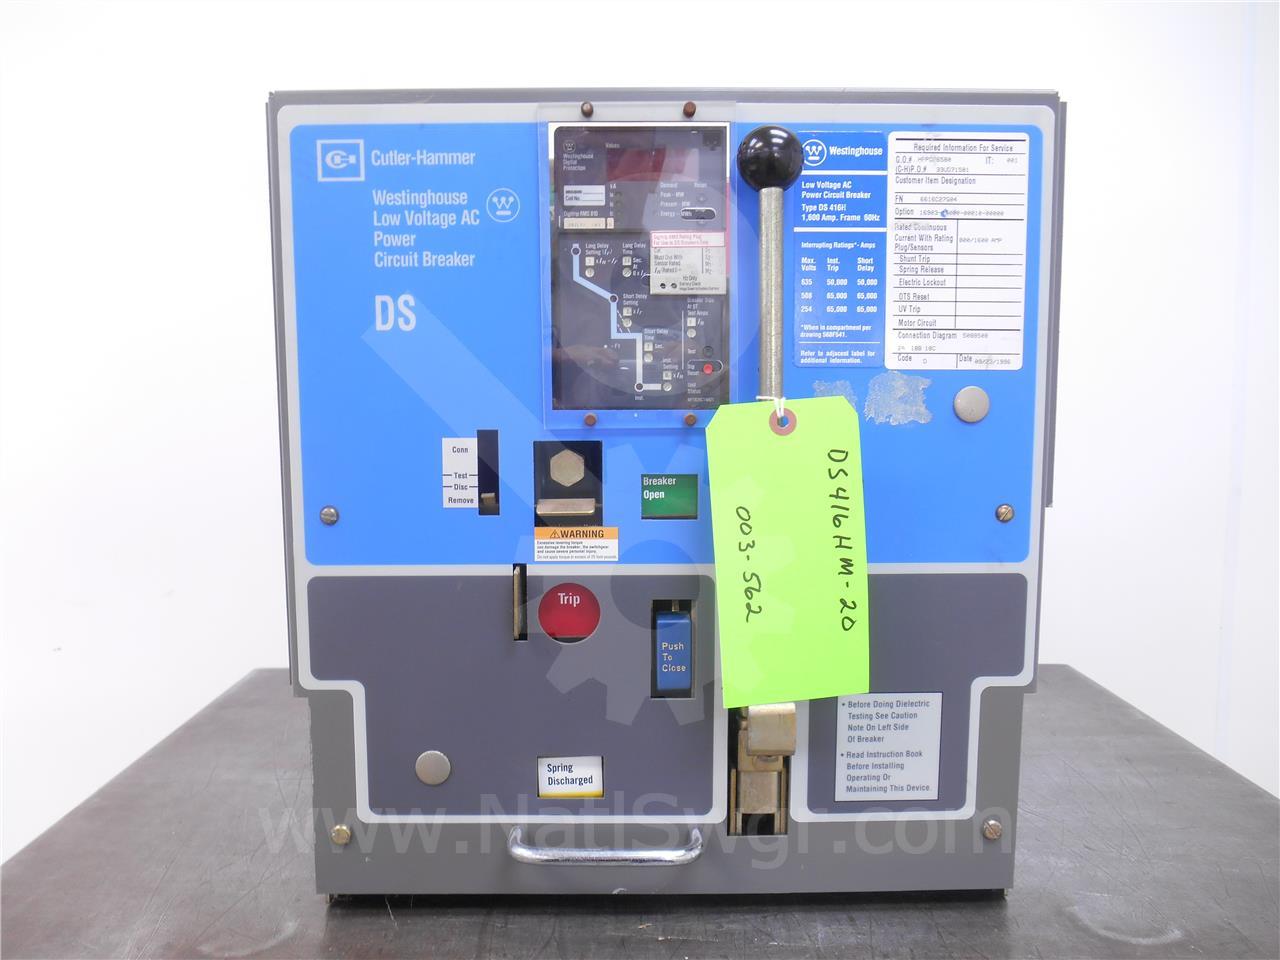 DS-416H 1600A Cutler-Hammer MO/DO RMS 810 LSI, 800A RP, 1600A CT, PTM